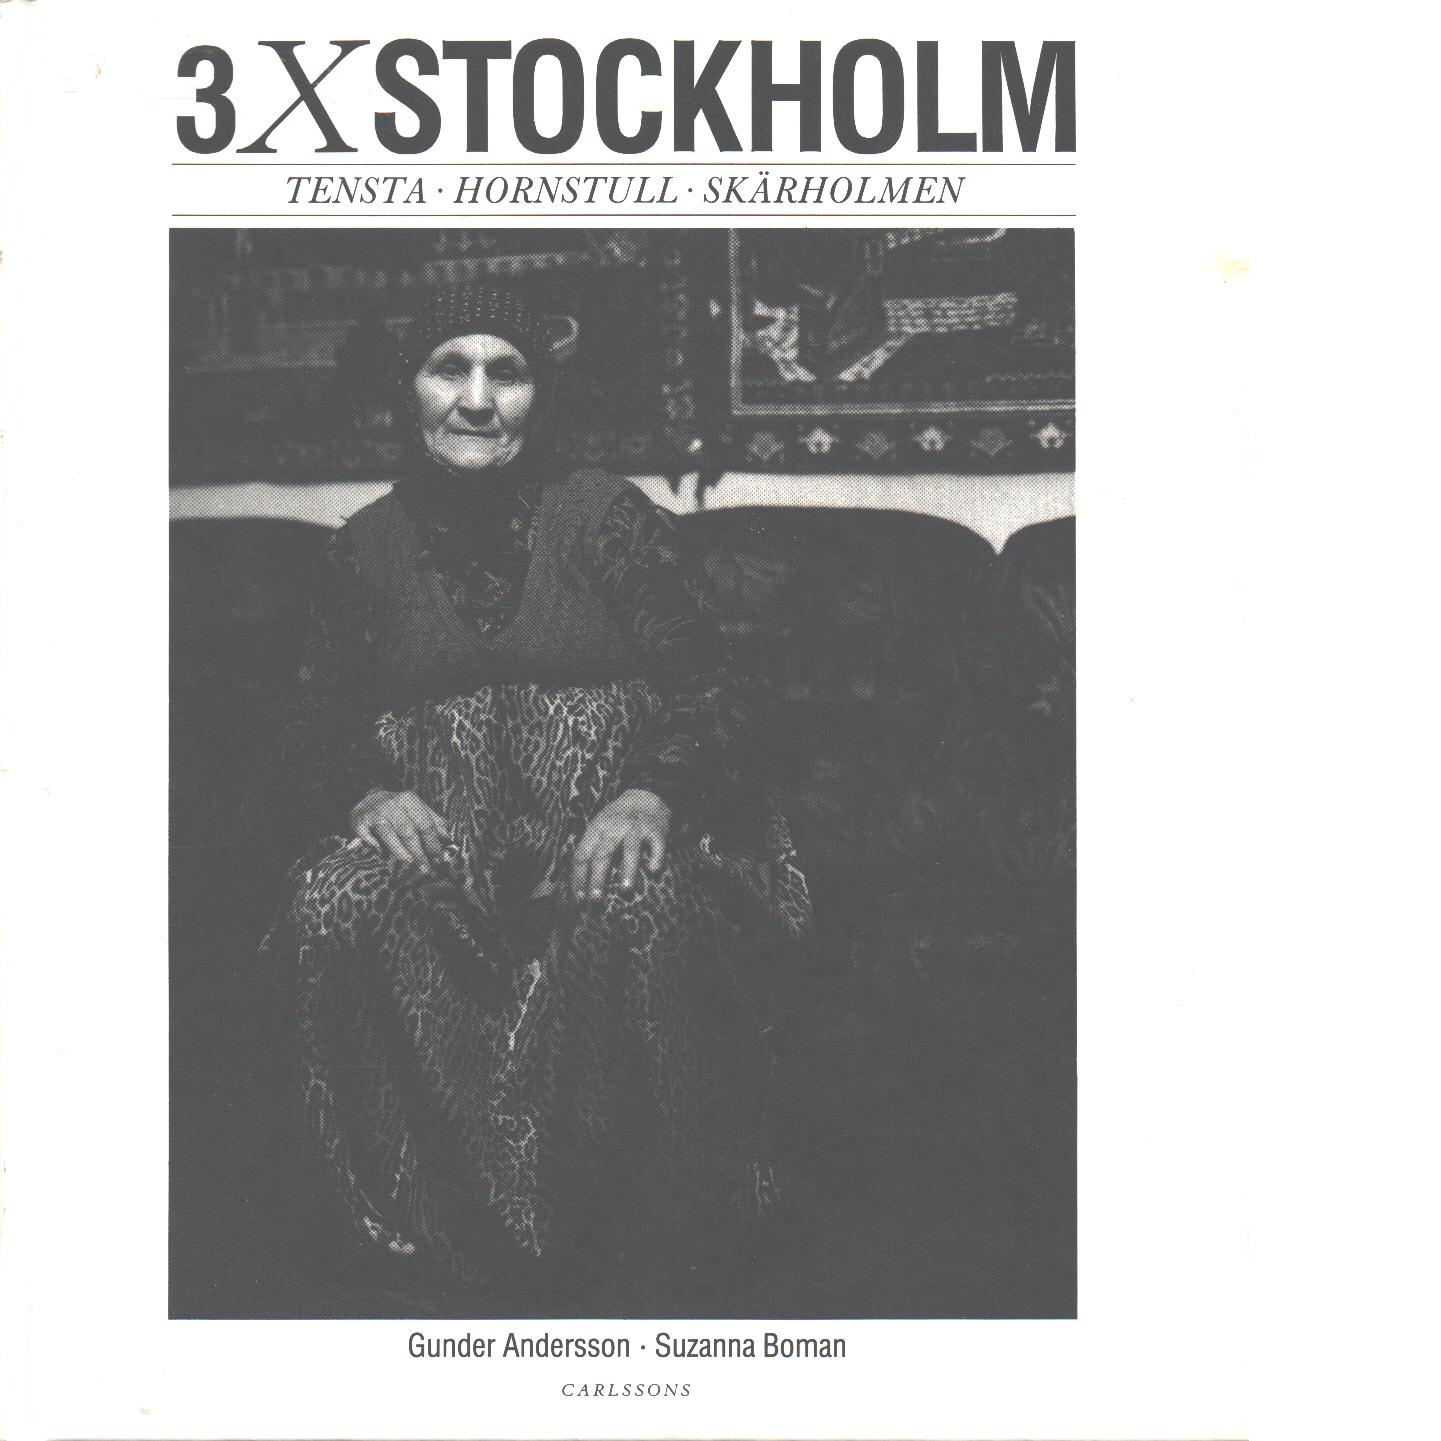 3 x Stockholm - Andersson, Gunder och Boman, Suzanna